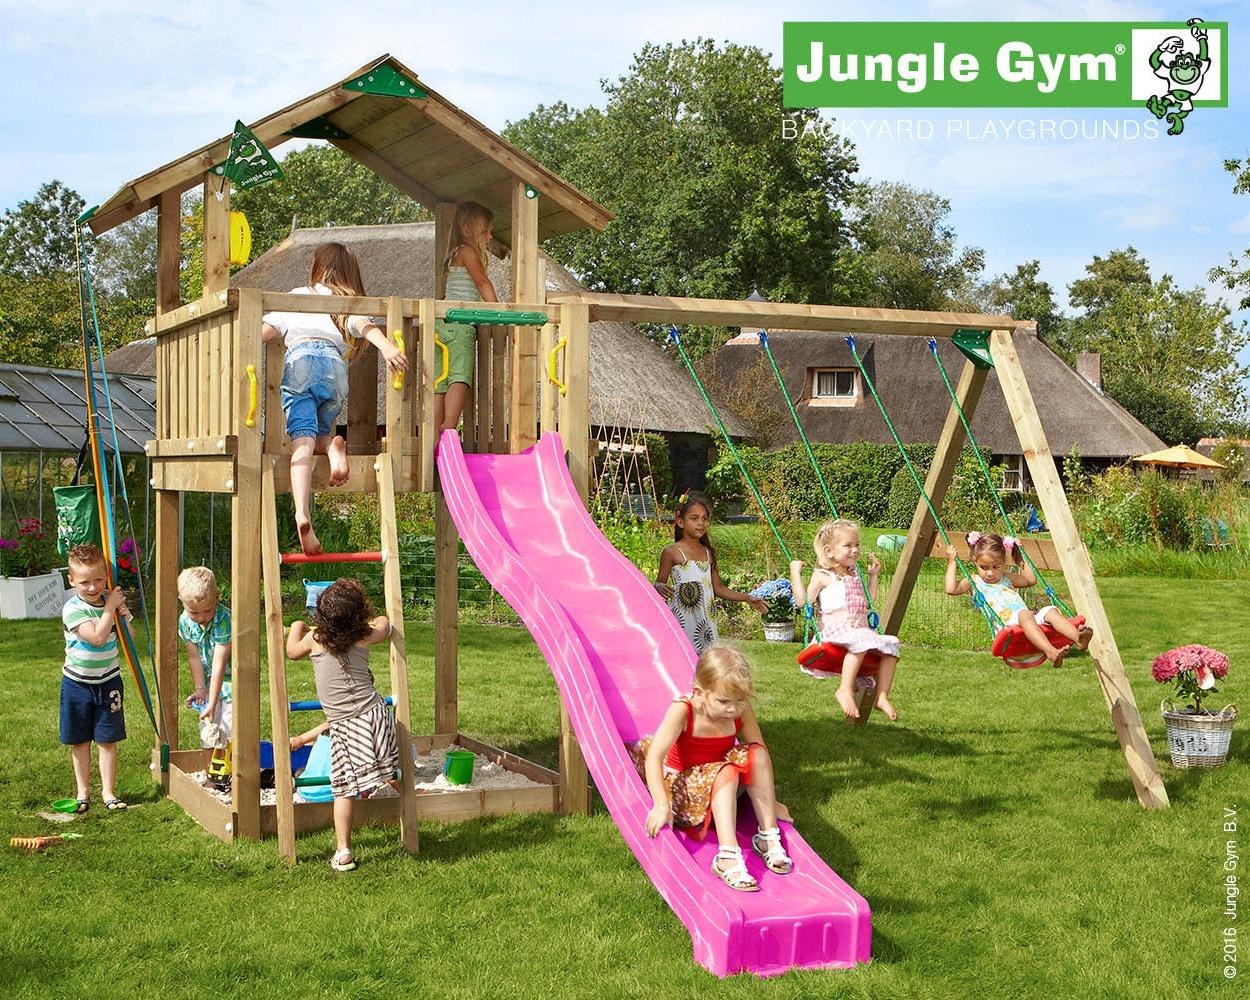 spielturm chalet jungle gym anbauschaukel 2 teilig pvc brettschaukel sprossenaufgang steuerrad bucket modul telefon bowi